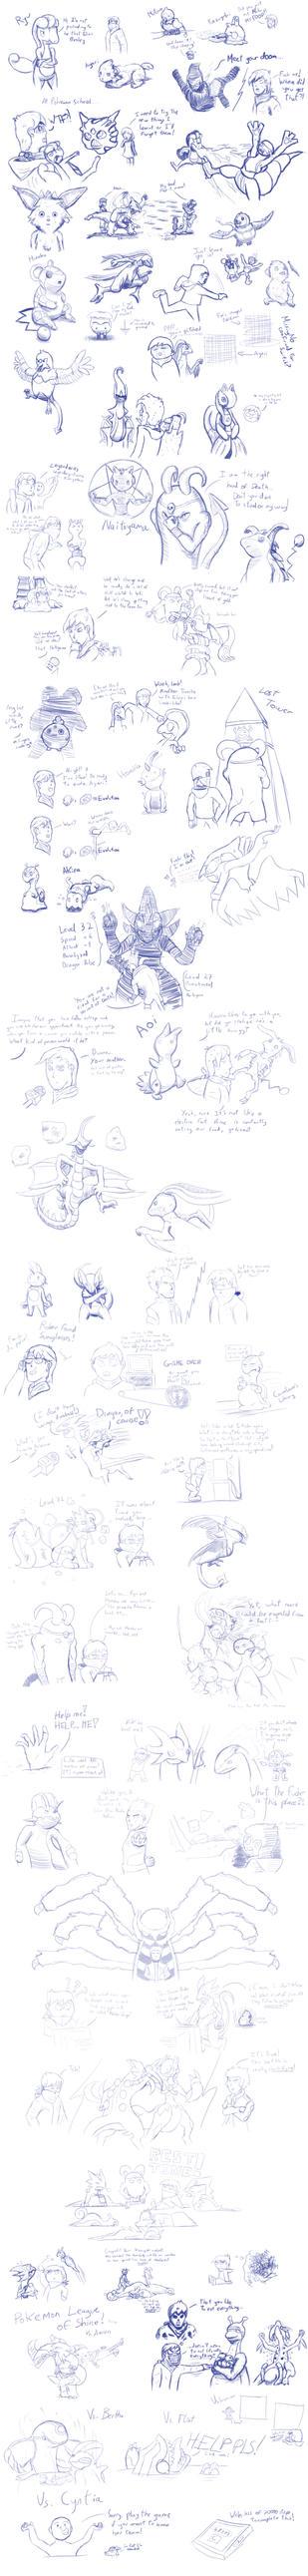 Pokemon Fusion Doodles Recopilation by E1XBlaster